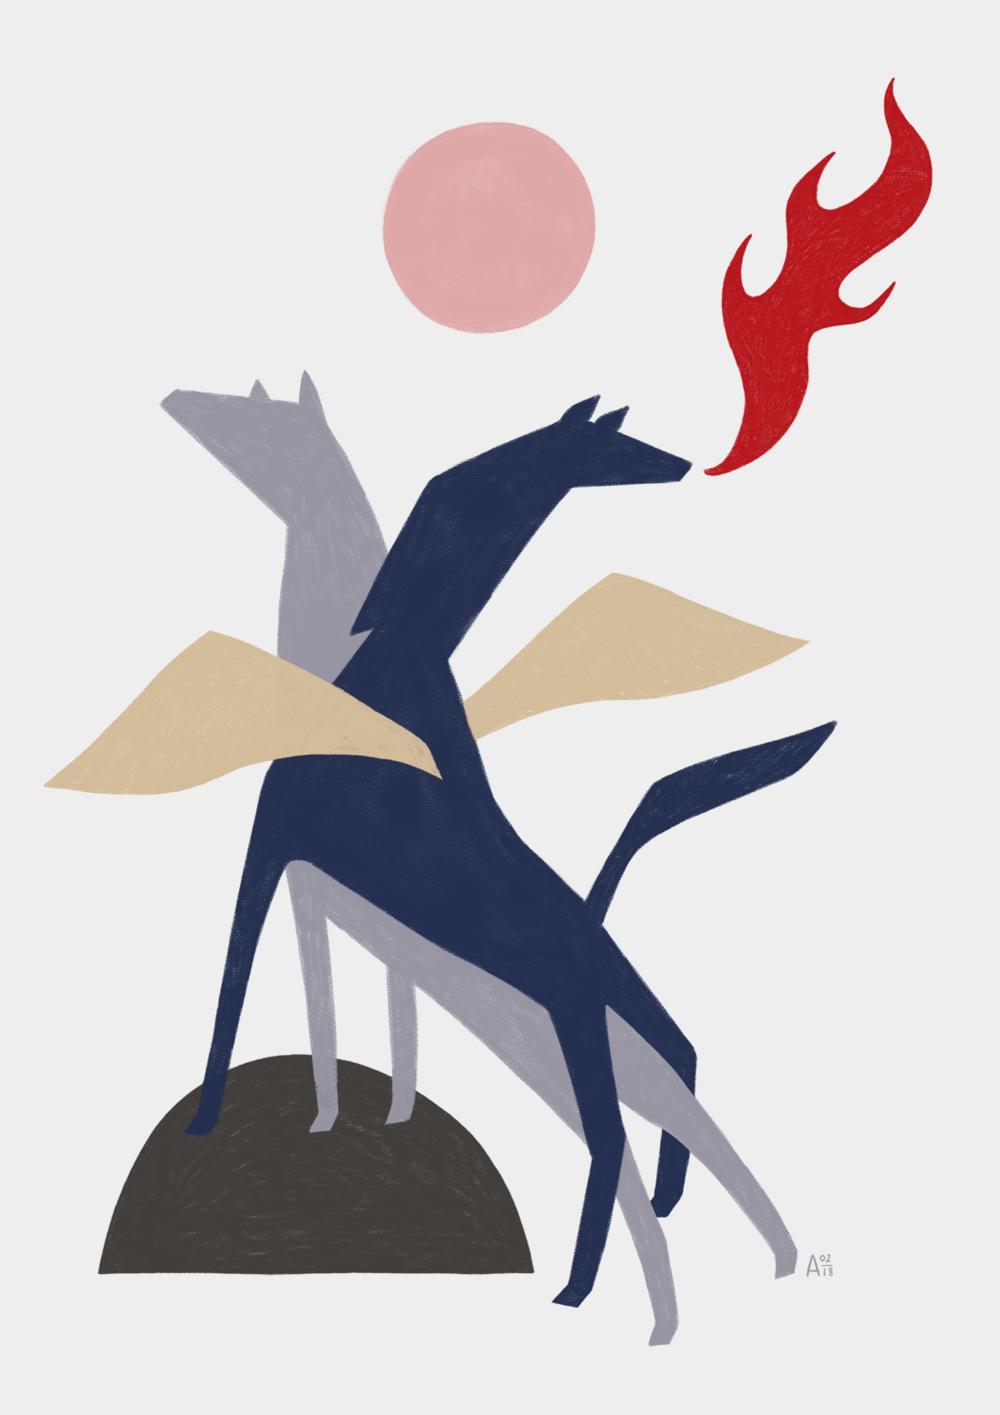 mating-pegasus-web.png